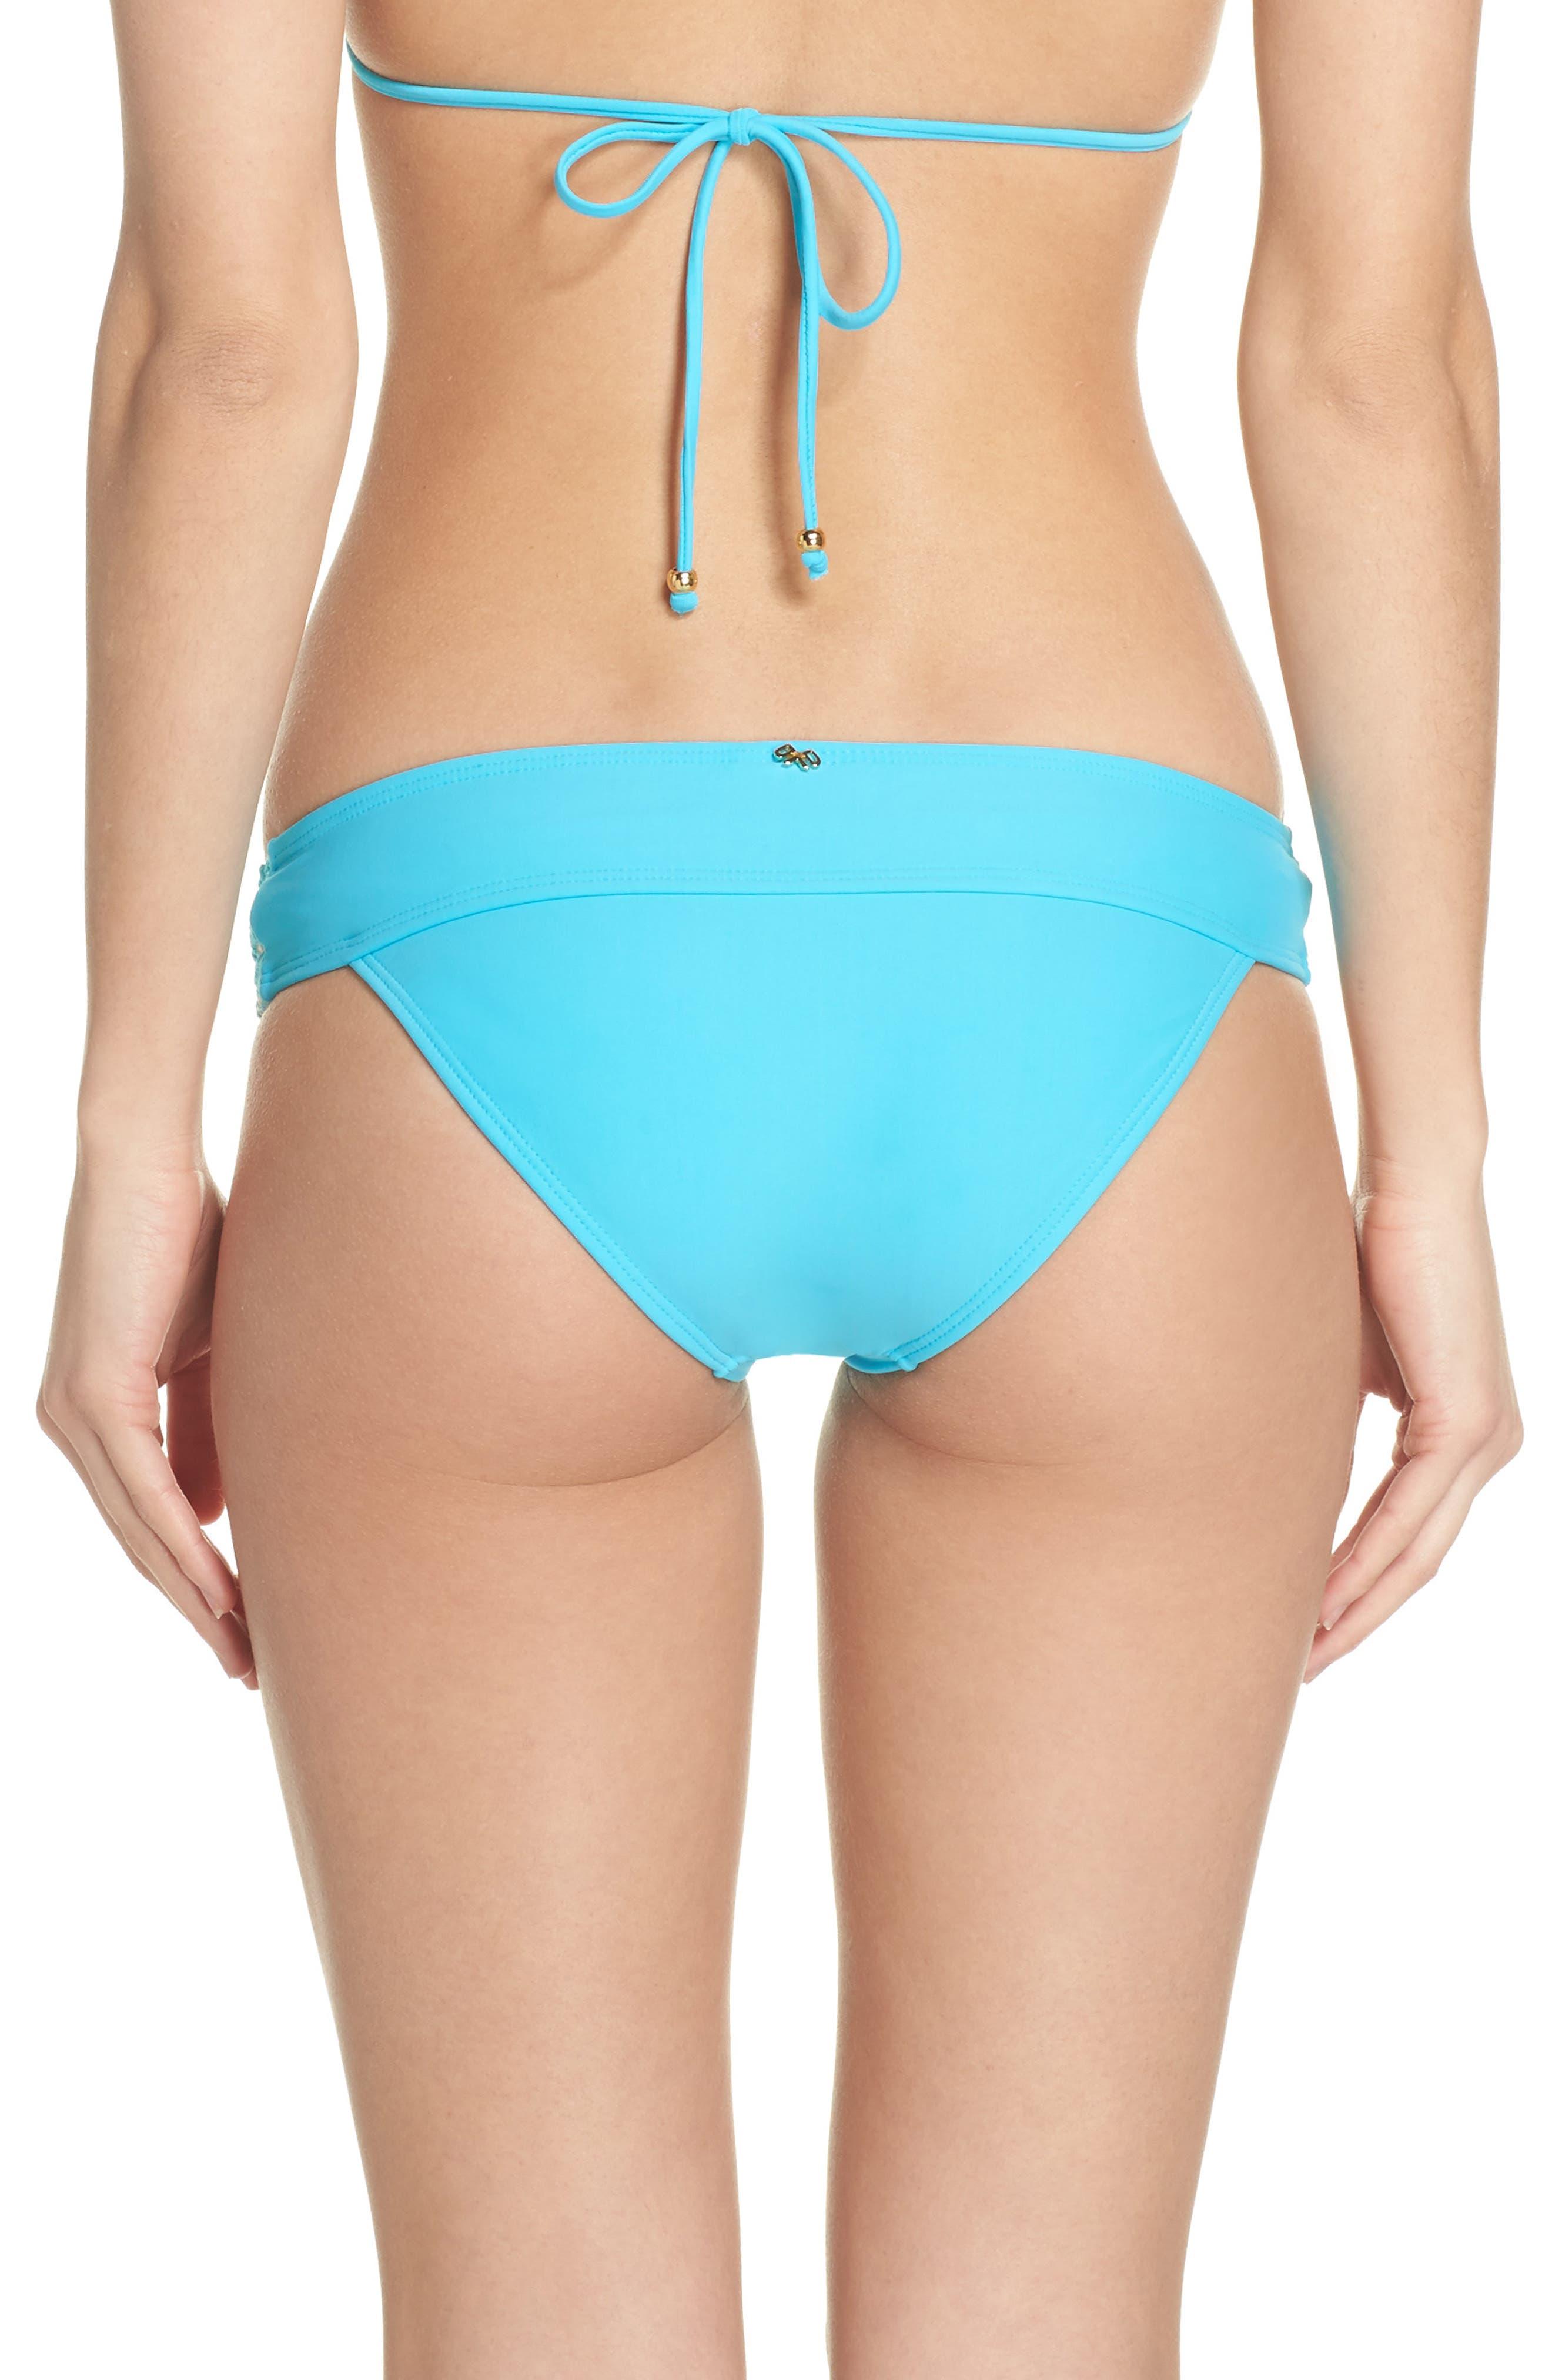 Banded Lace Bikini Bottoms,                             Alternate thumbnail 2, color,                             Marine